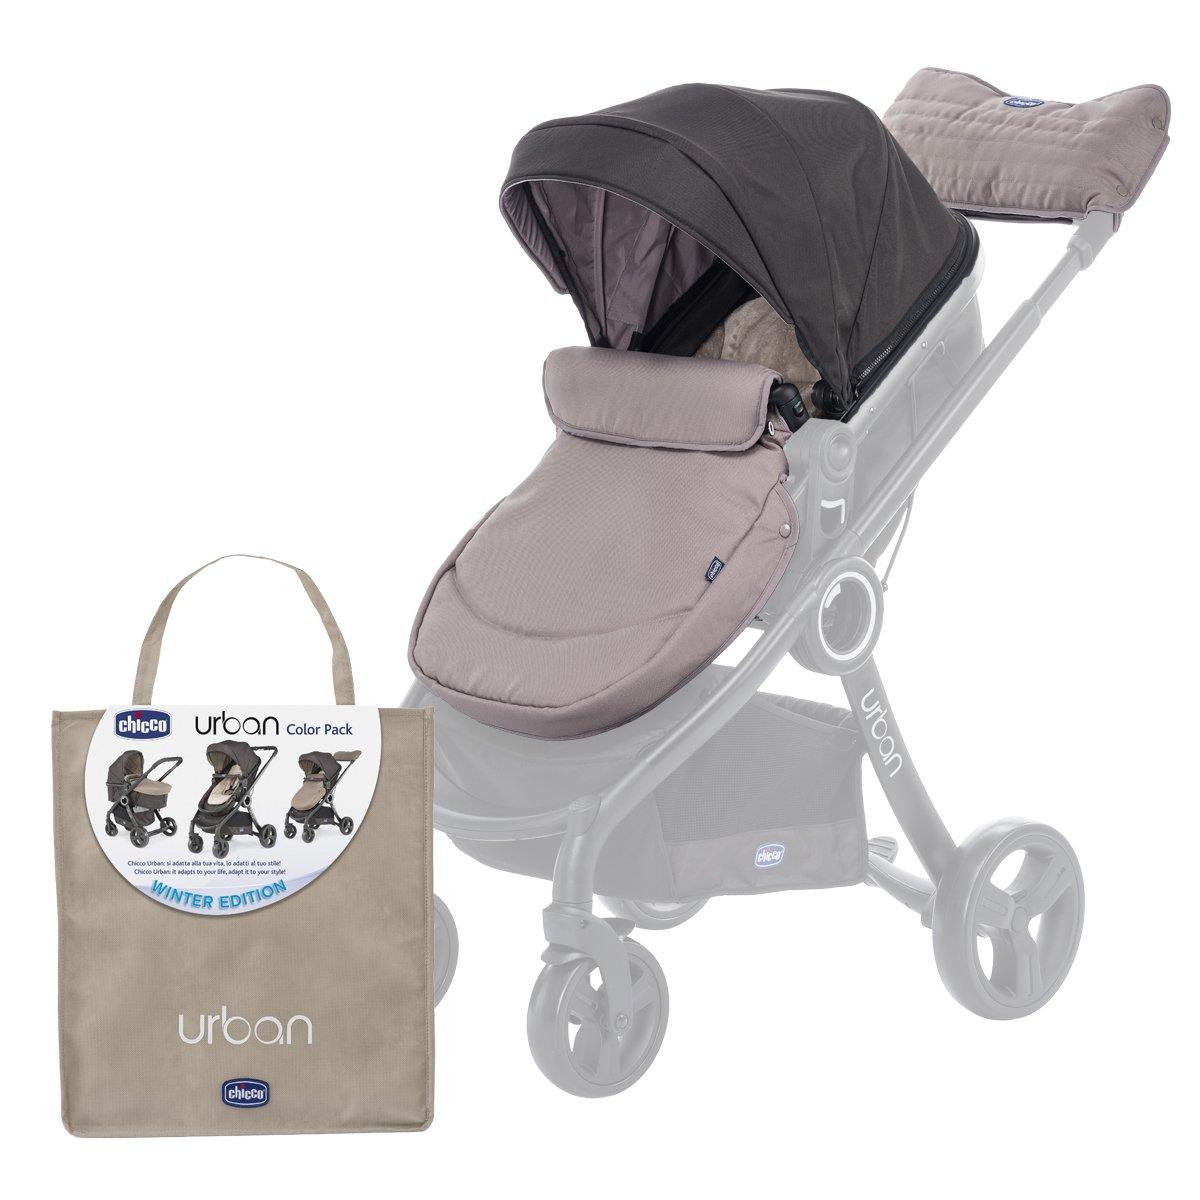 Chicco 79337 Colour Pack Urban Stroller Kit Passeggino, Beige/Nero (Winter Day) Artsana 79337120000